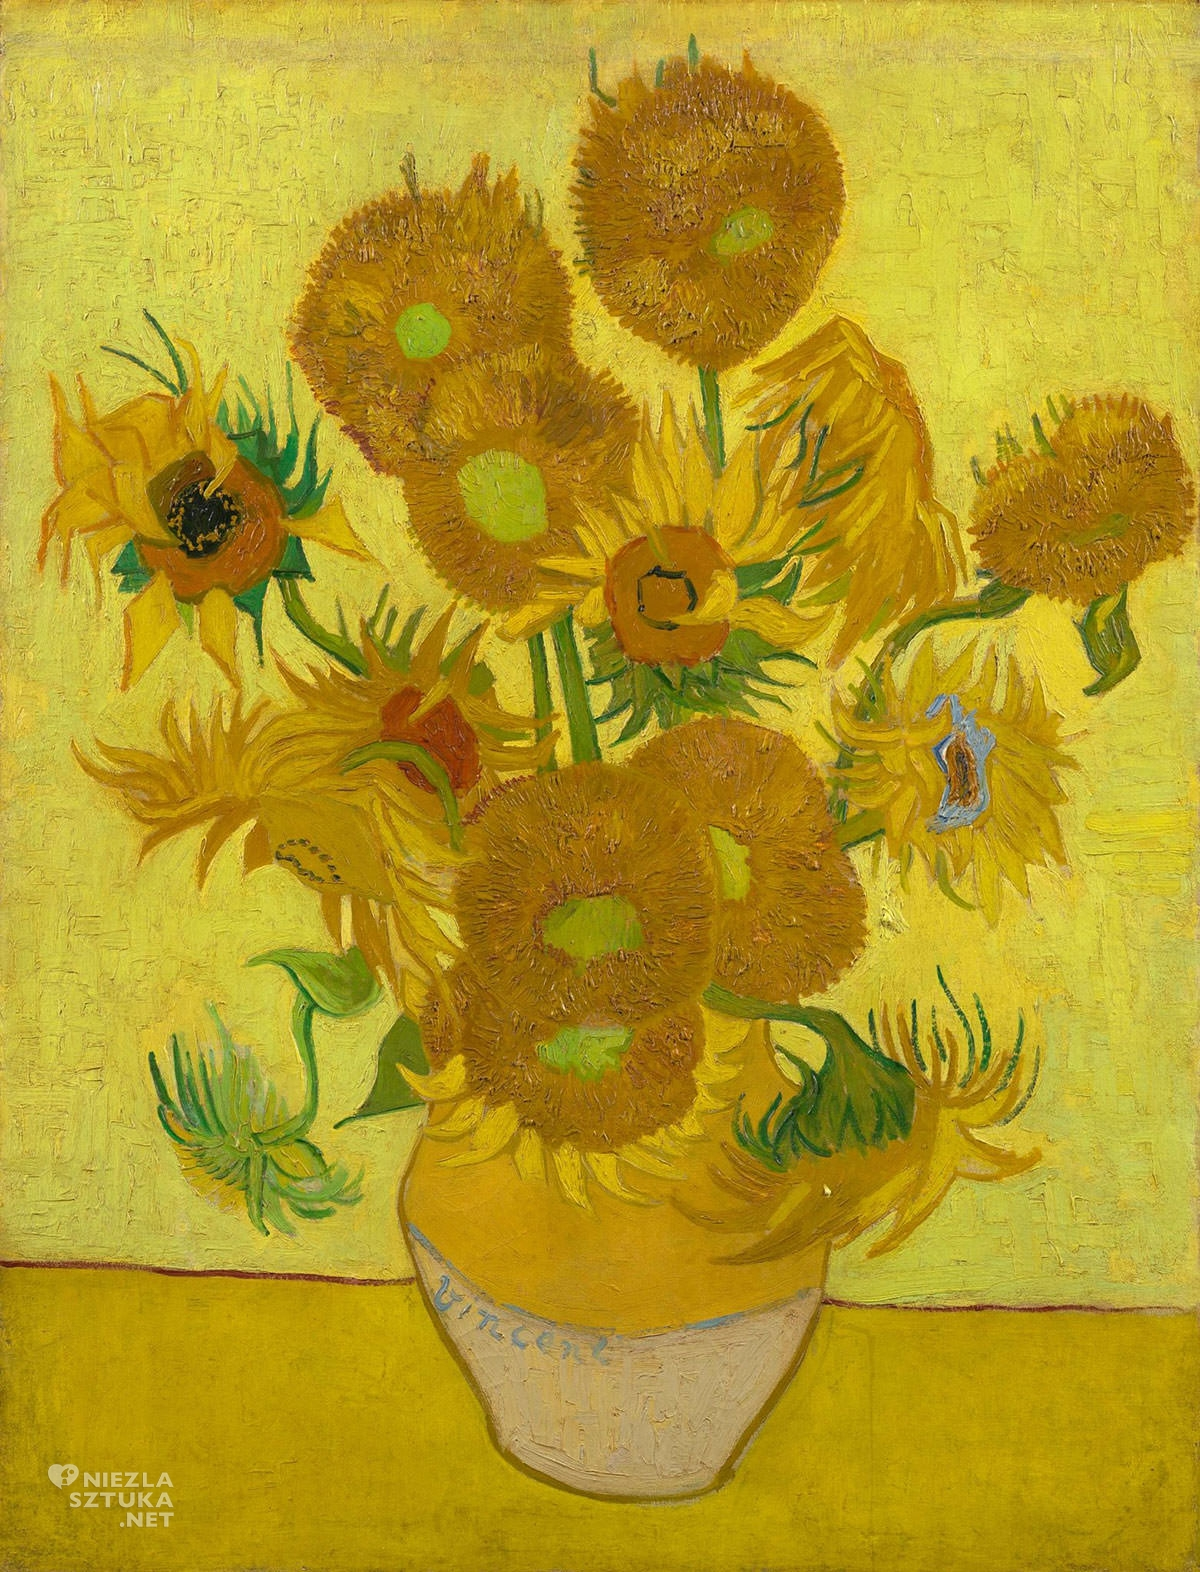 Vincent van Gogh, van Gogh słoneczniki, słoneczniki, van Gogh Museum Amsterdam, malarstwo holenderskie, Niezła sztuka